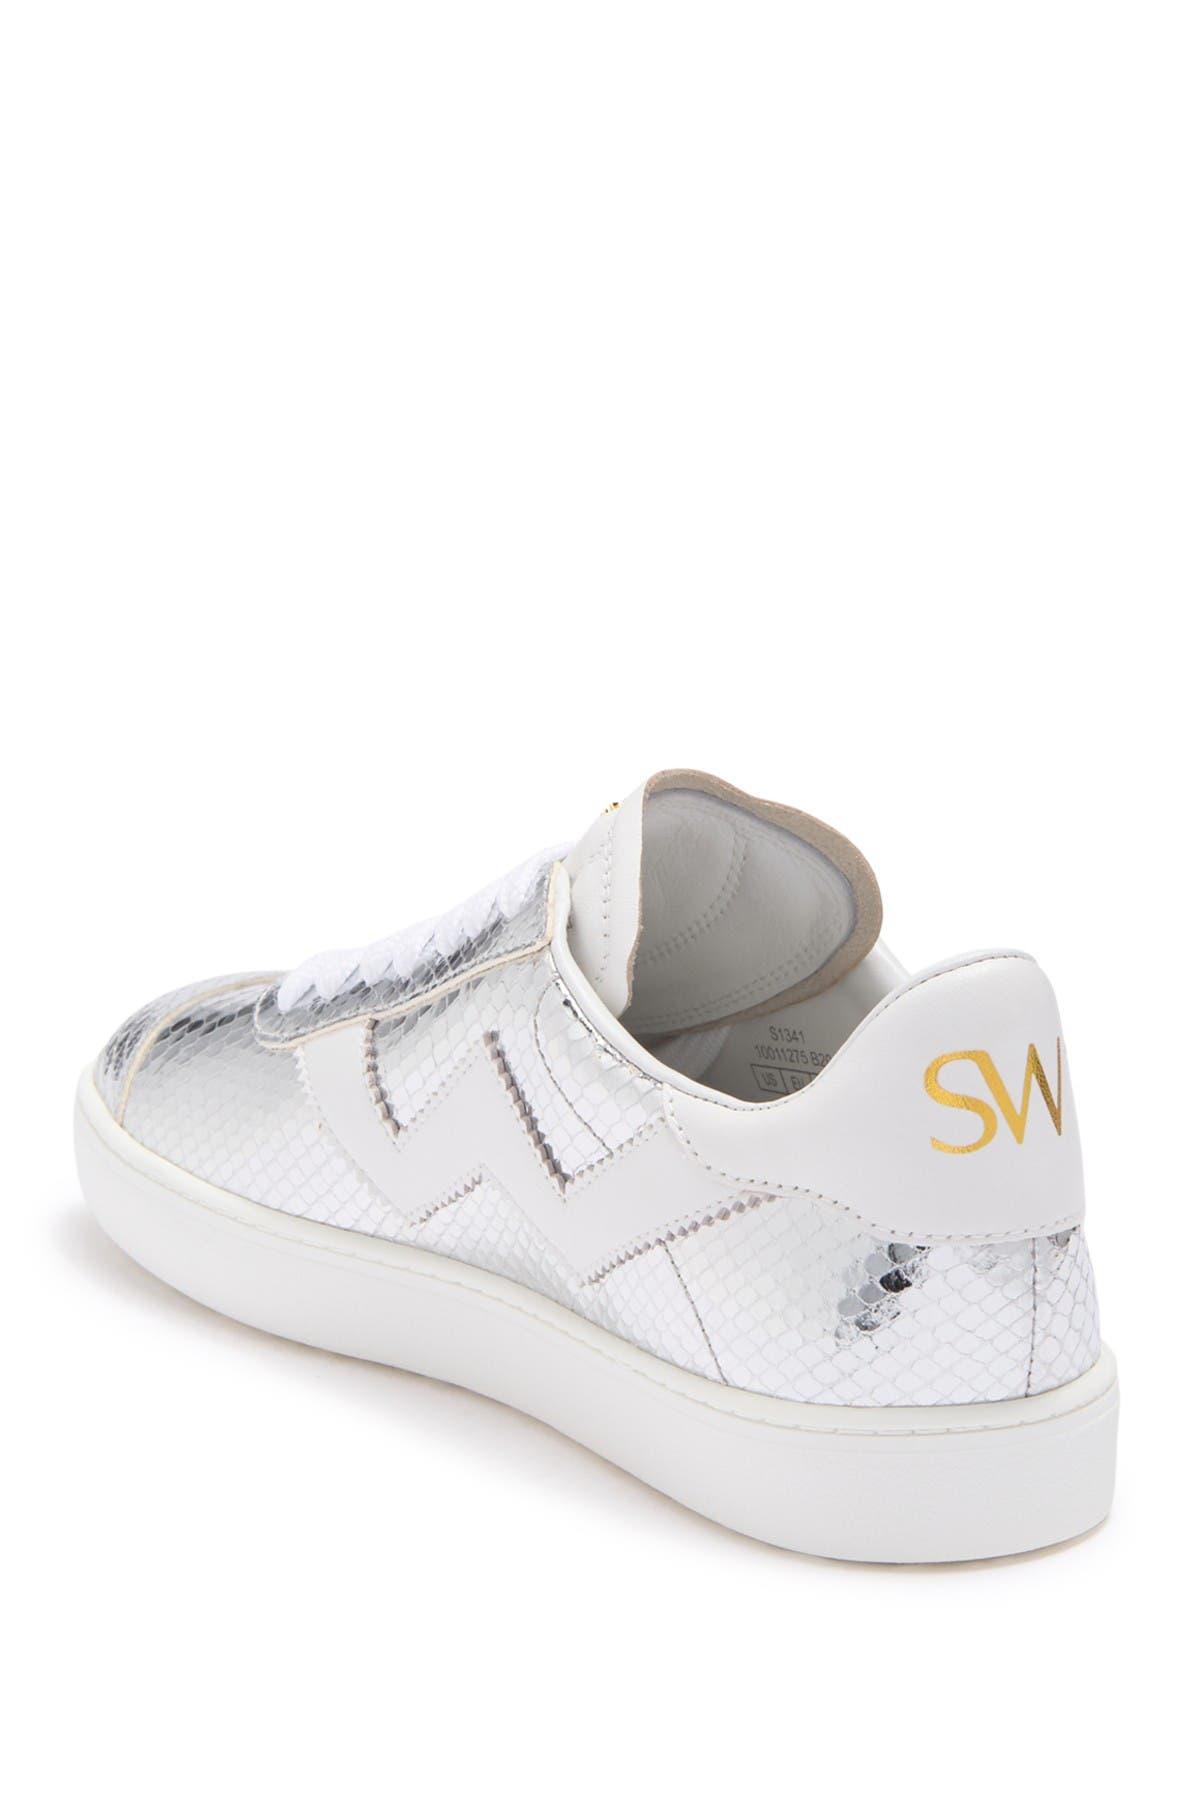 Image of Stuart Weitzman Daryl Snake Print Tech Sneaker